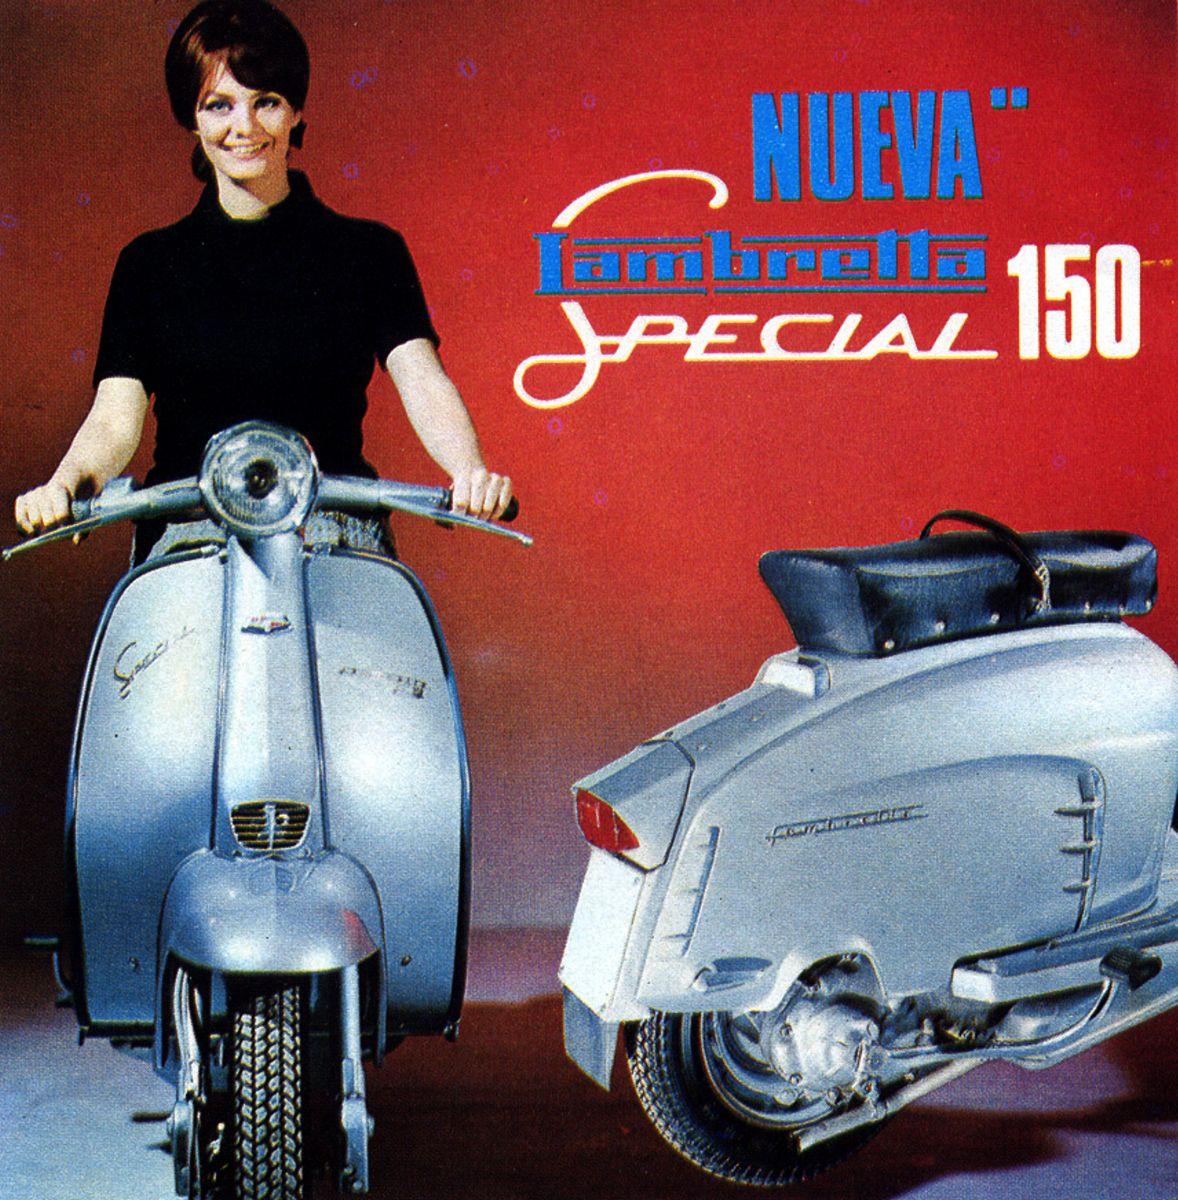 Lambretta Motorcycle Ad, 1966.